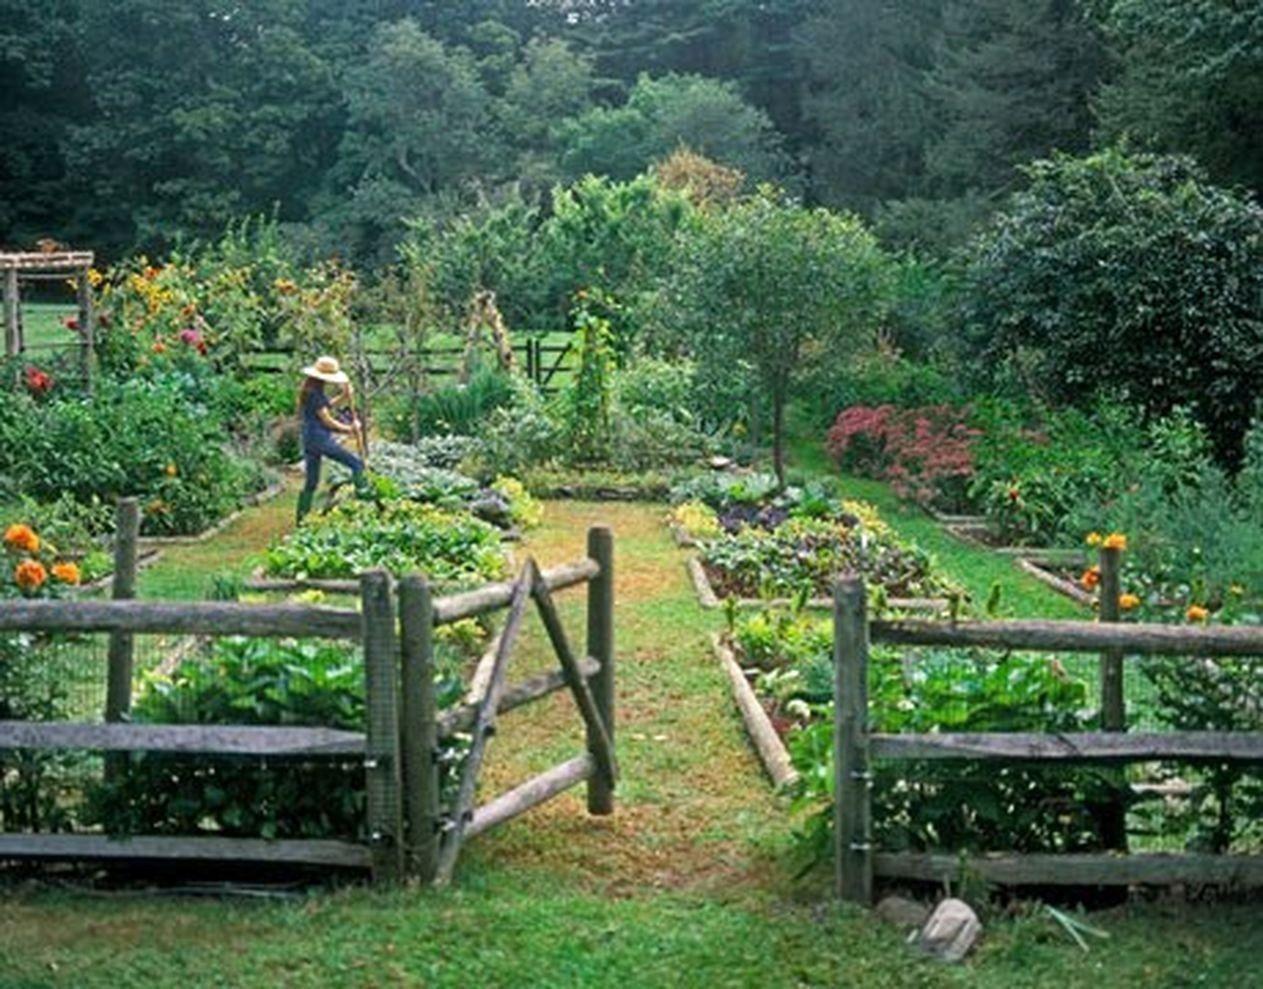 Rustic Vegetable Garden Design Ideas For Your Backyard Inspiration 10